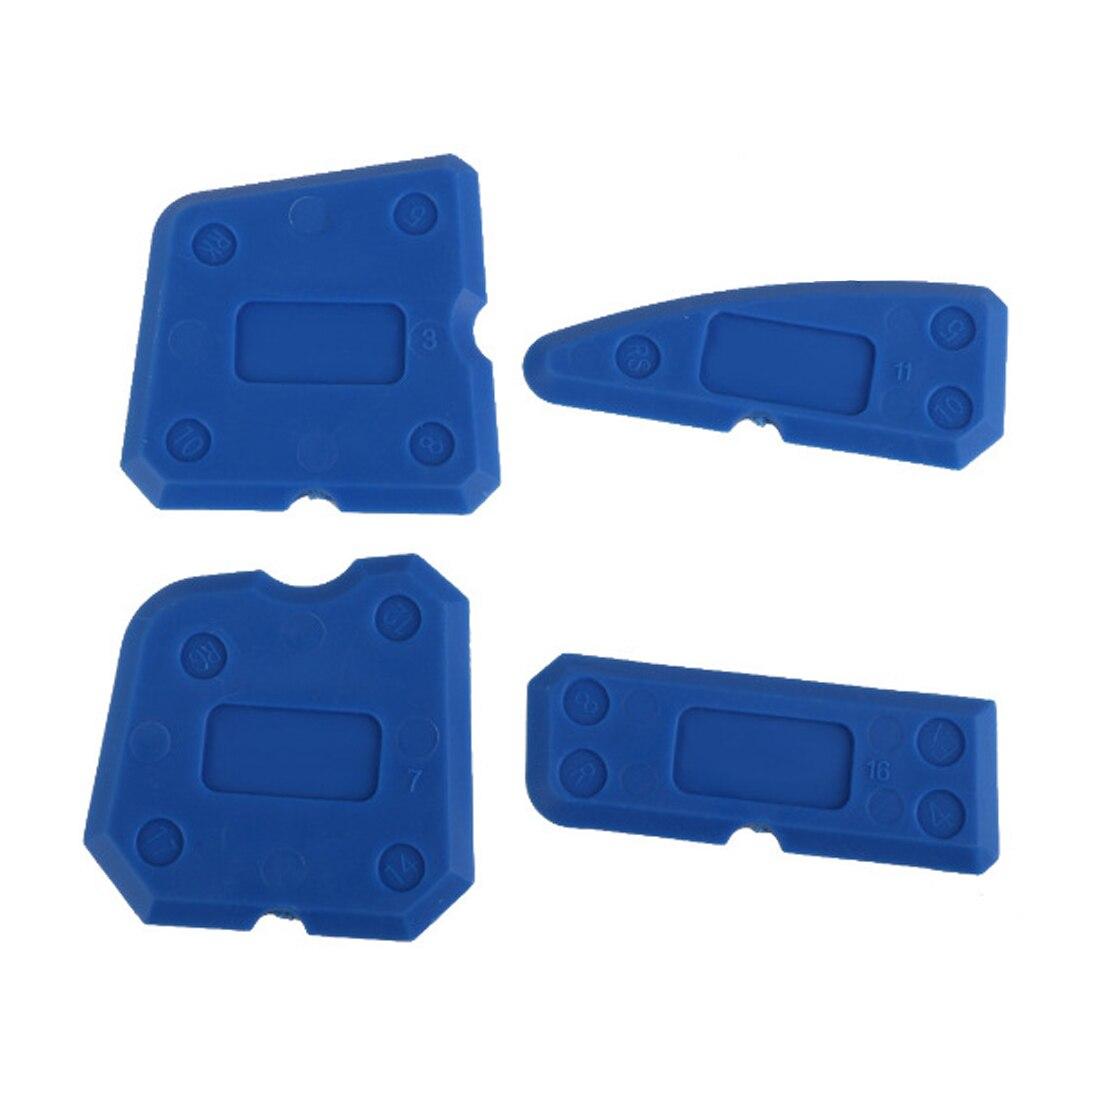 Hot Caulking Tool Kit 4pcs/set Joint Sealant Silicone Grout Remover Scraper Blue Hand Tools Set Scraper Tools